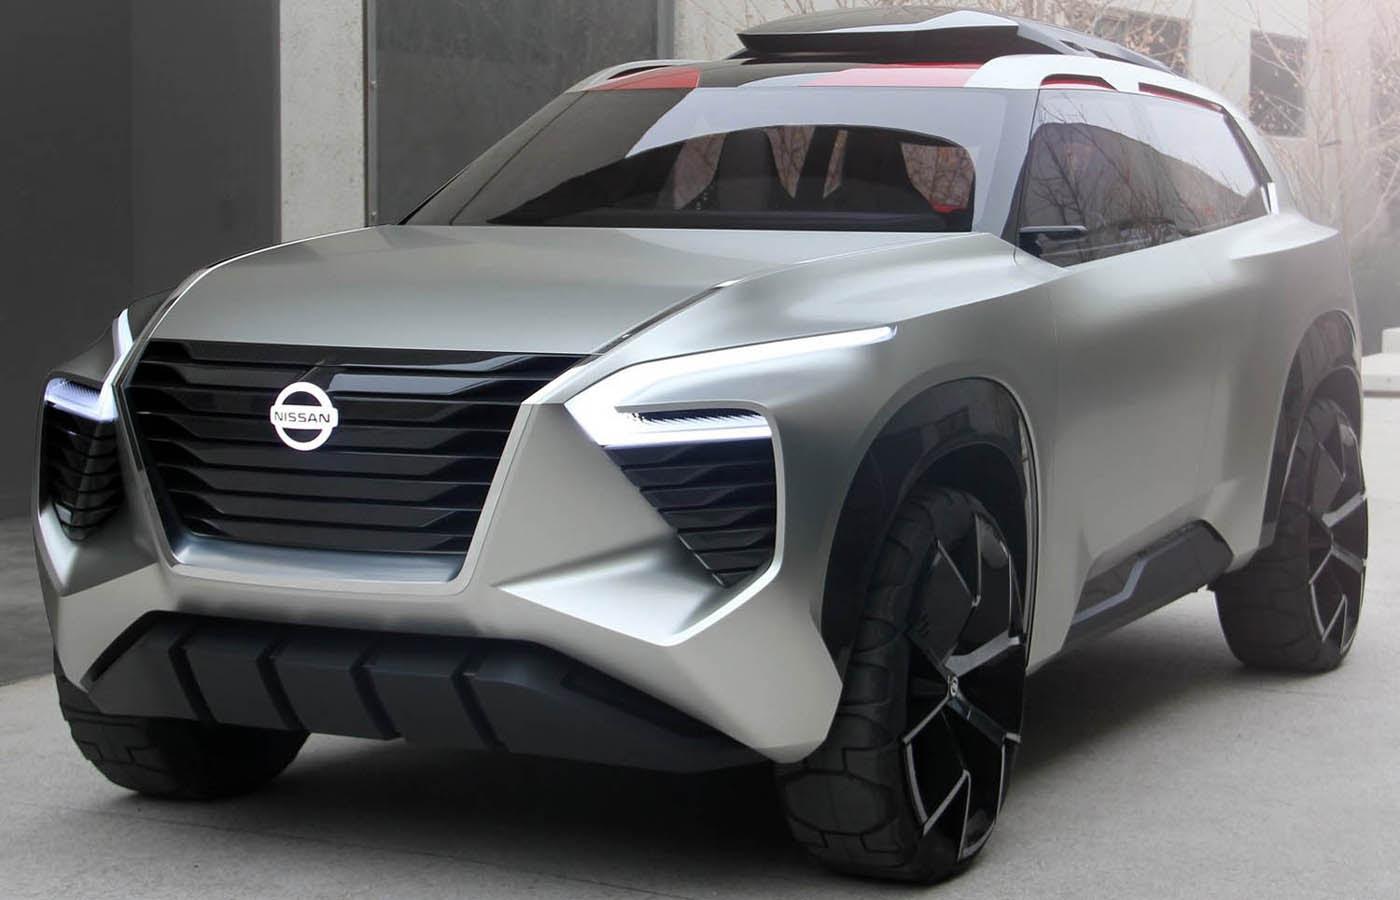 p33a nissan vehicle model  nissan 2021 cars